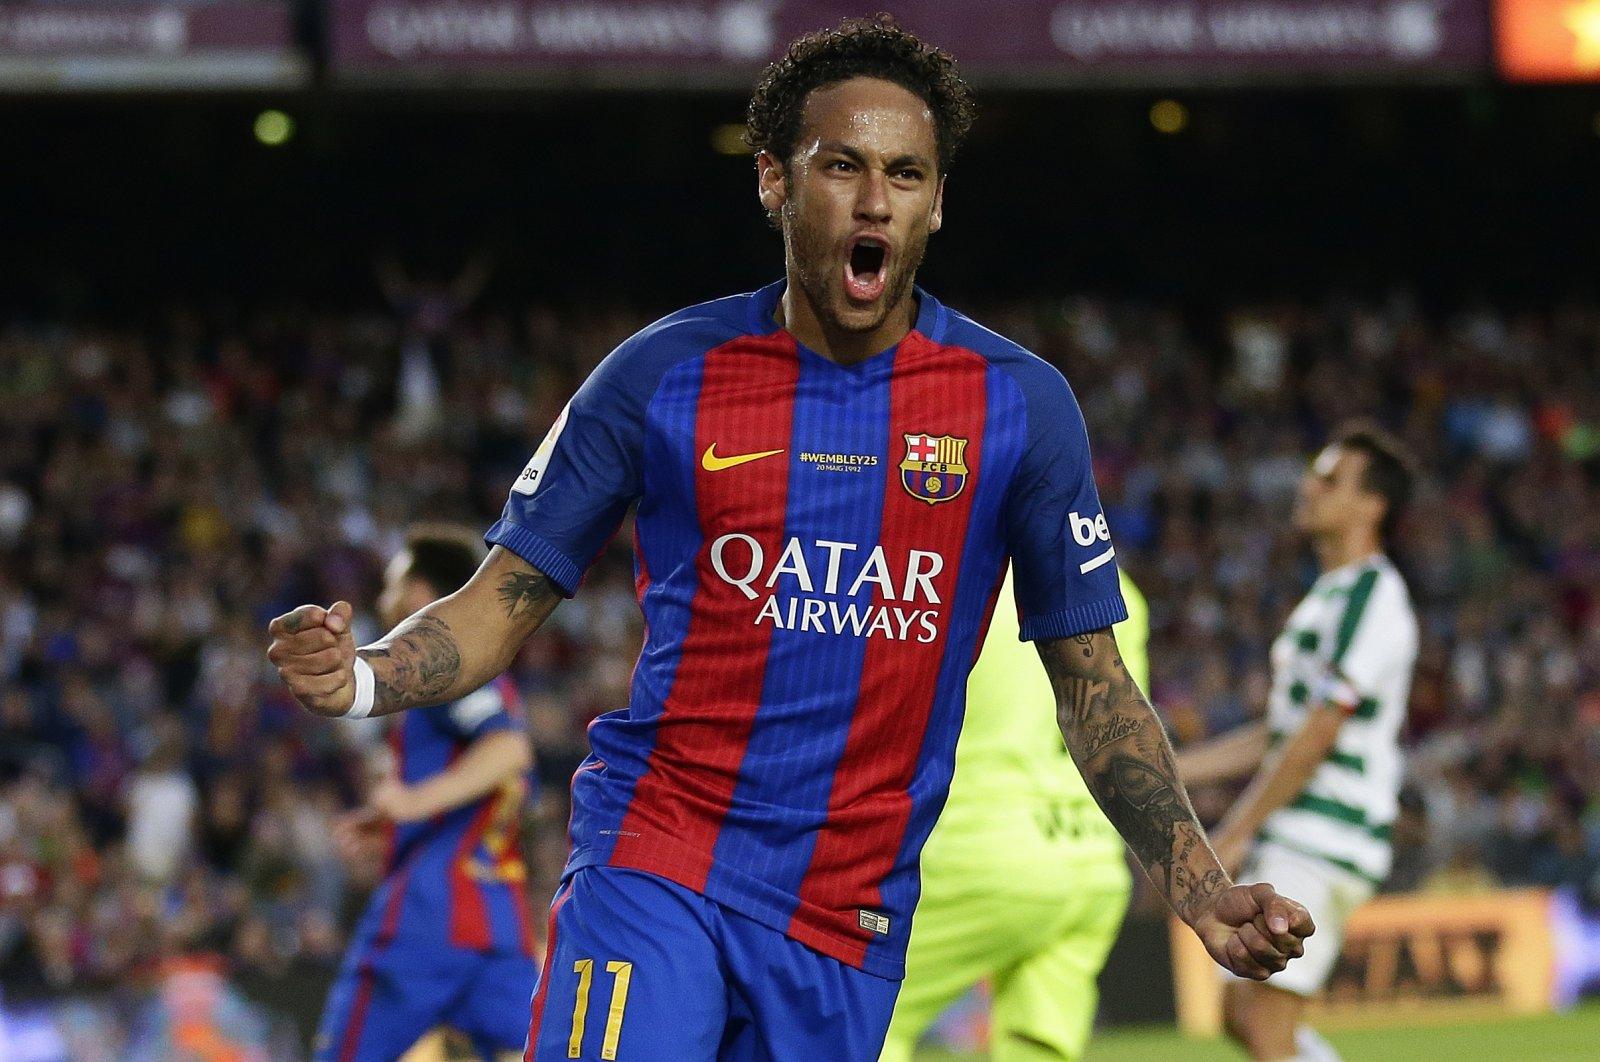 Former Barcelona player Neymar celebrates a goal during a La Liga match against Eibar, in Barcelona, Spain, May 21, 2017. (AP Photo)